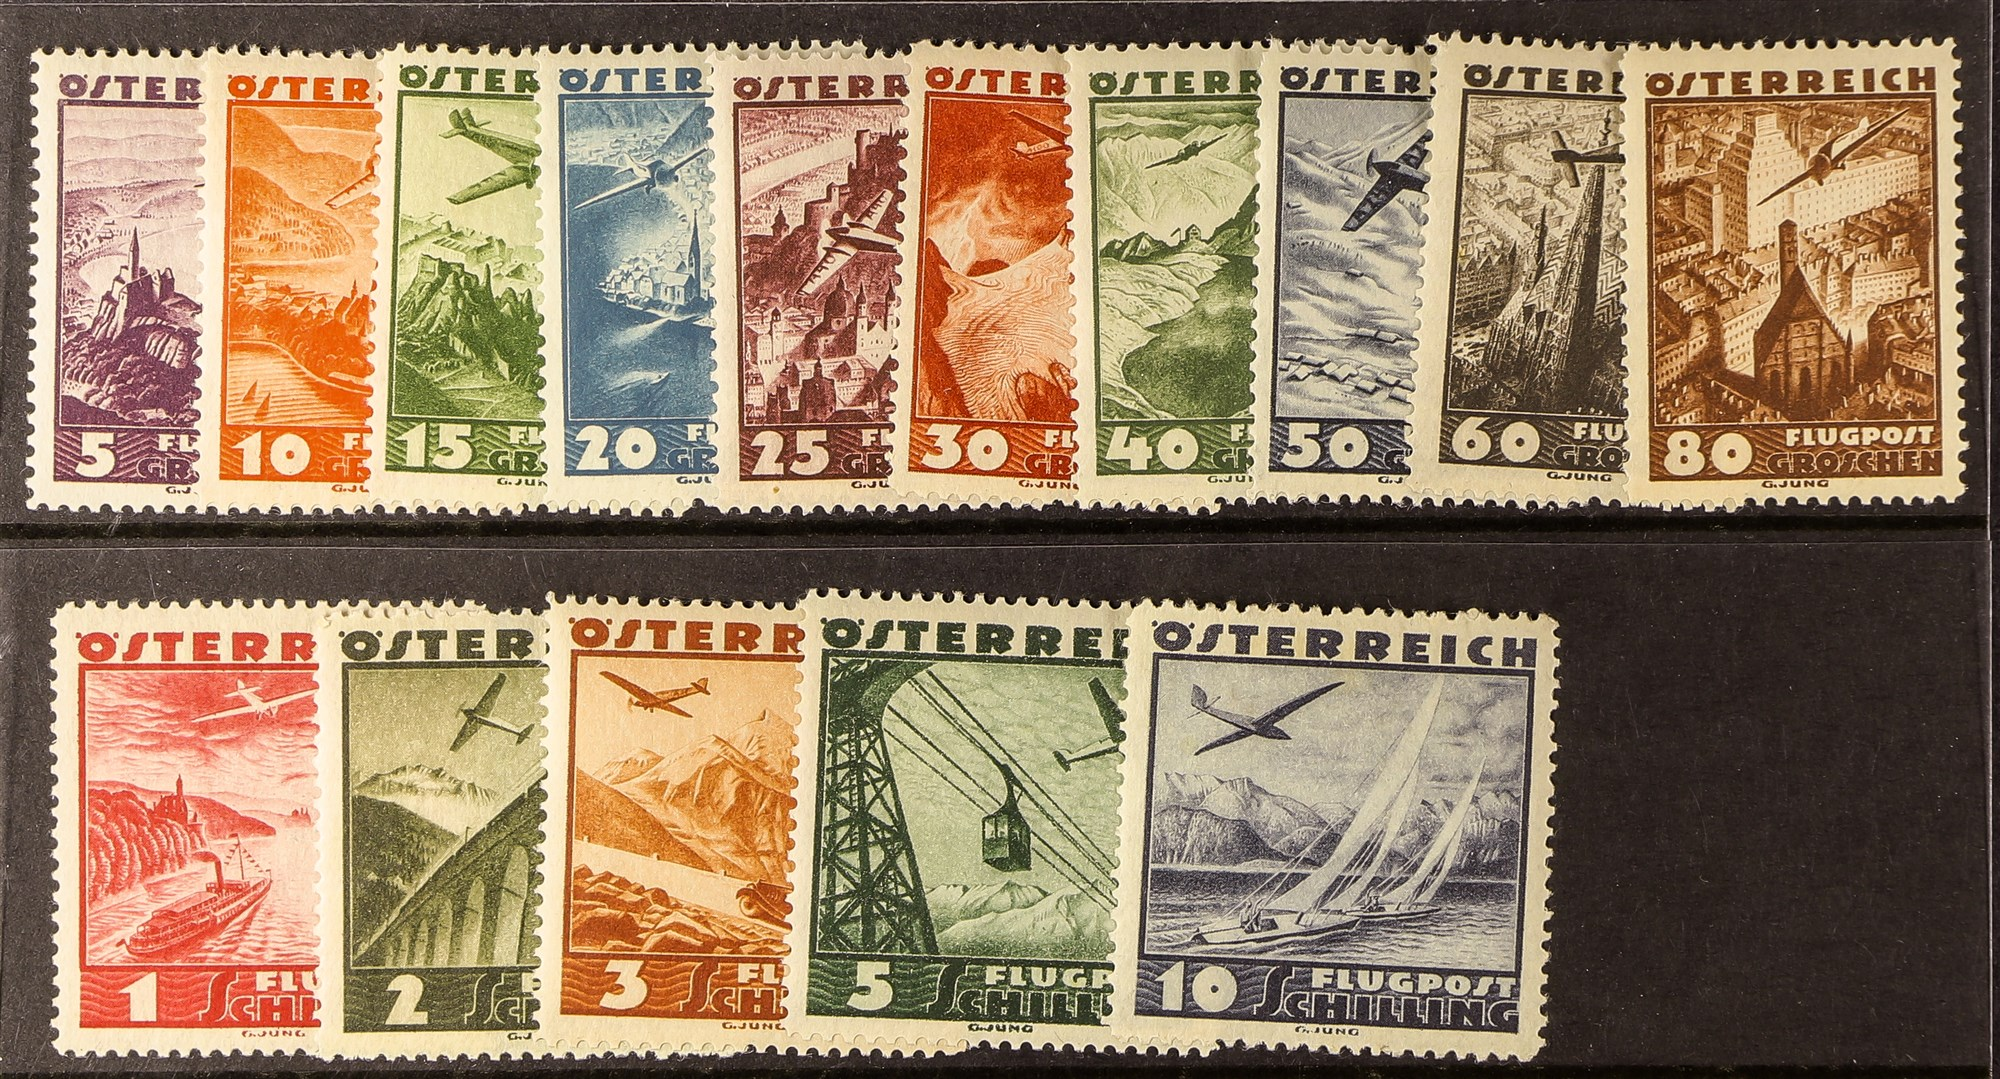 AUSTRIA 1935 Air set, Mi. 598/612, never hinged mint. Cat €190. (15 stamps)